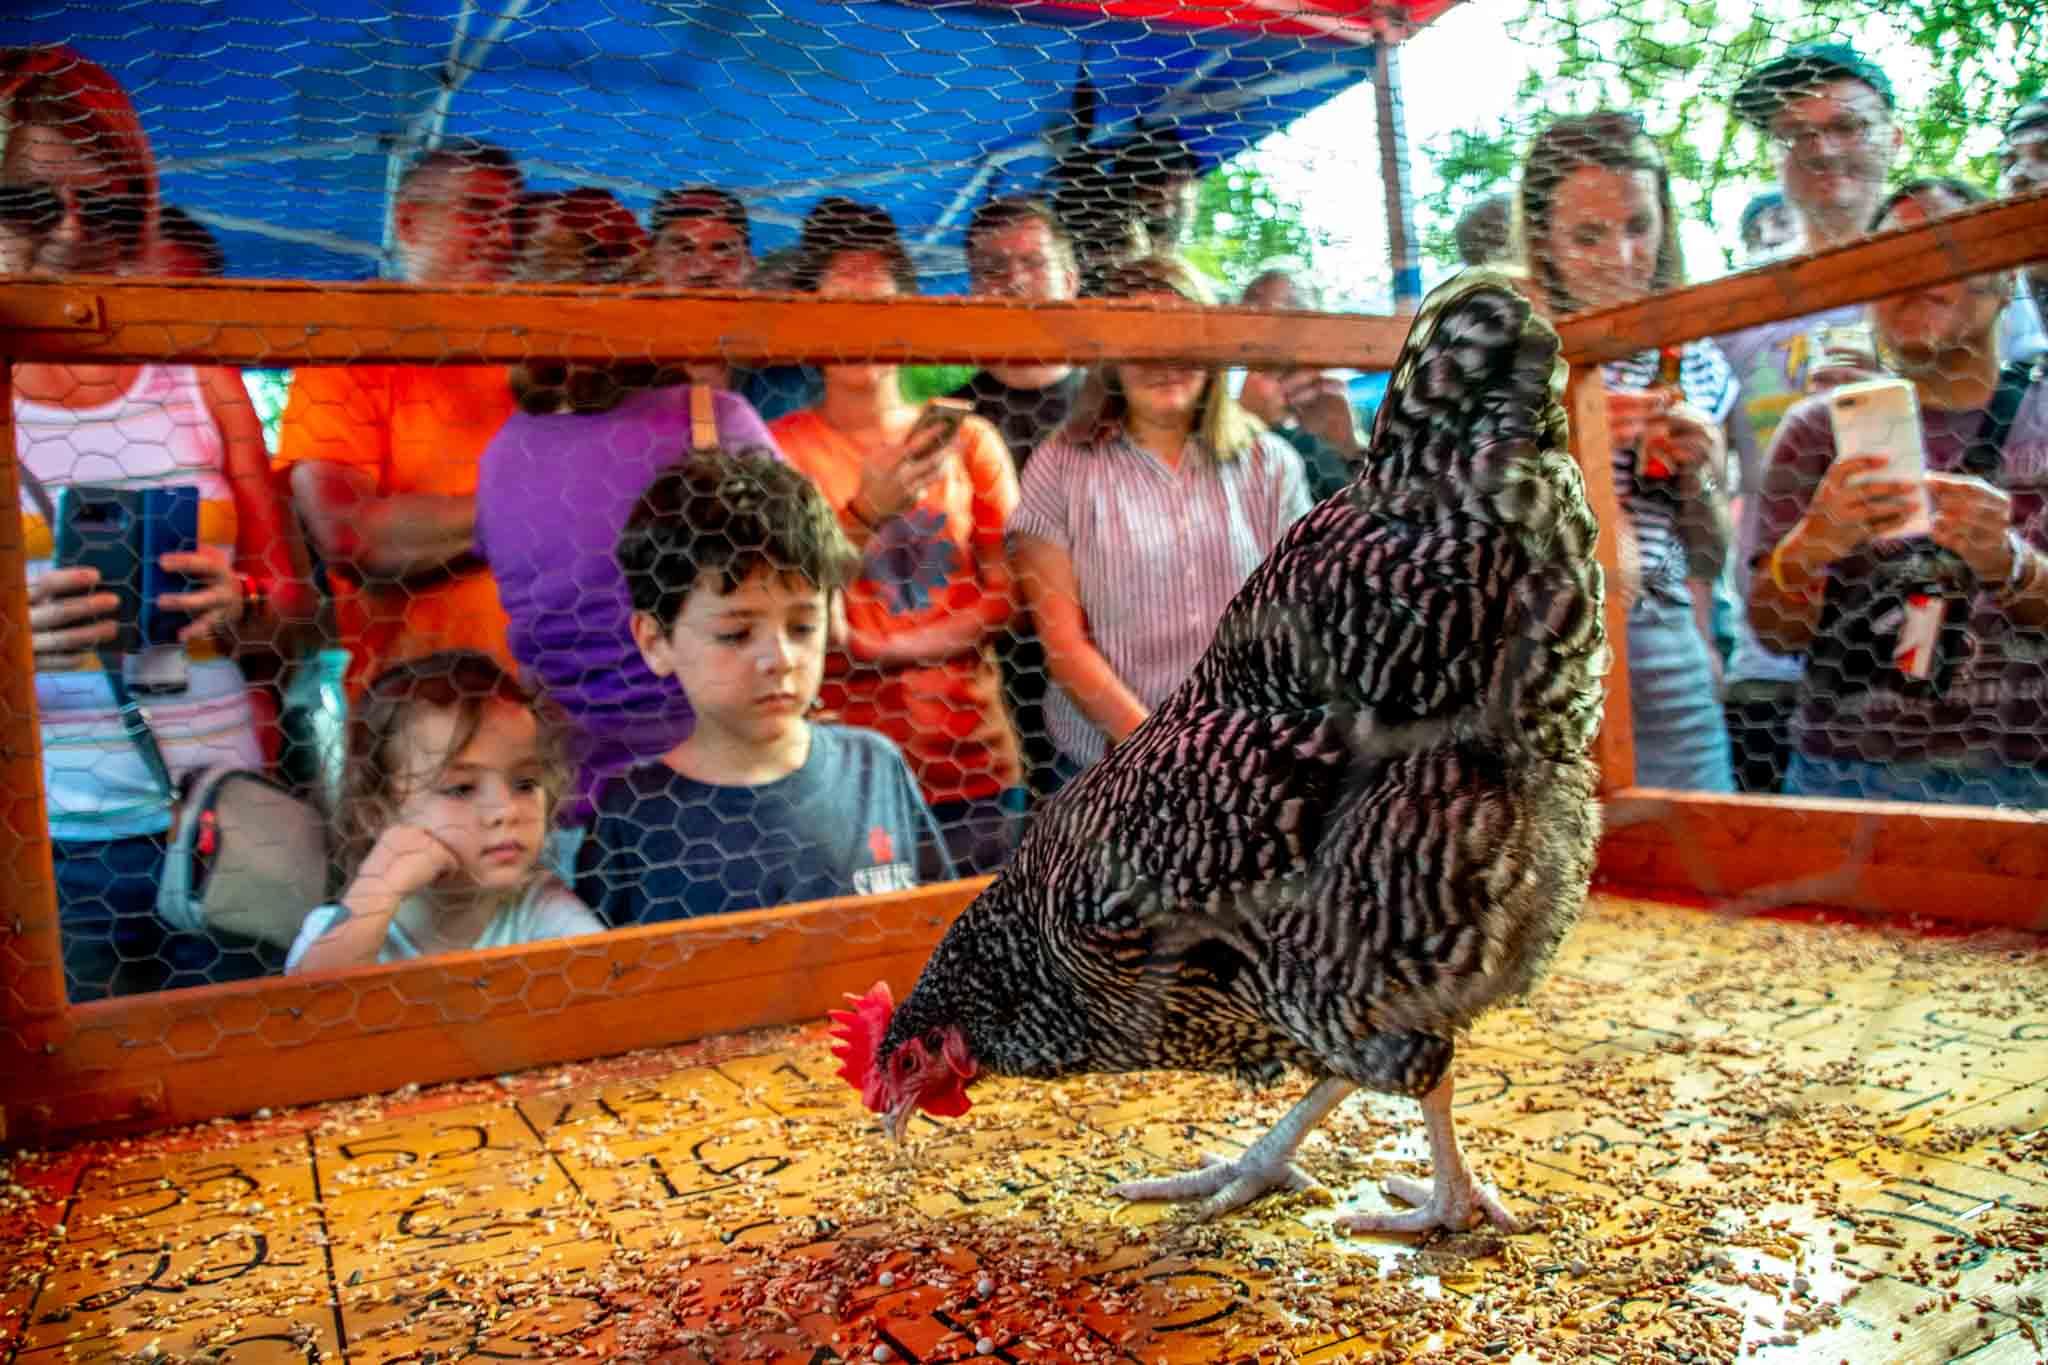 Kids watching a chicken on the bingo board